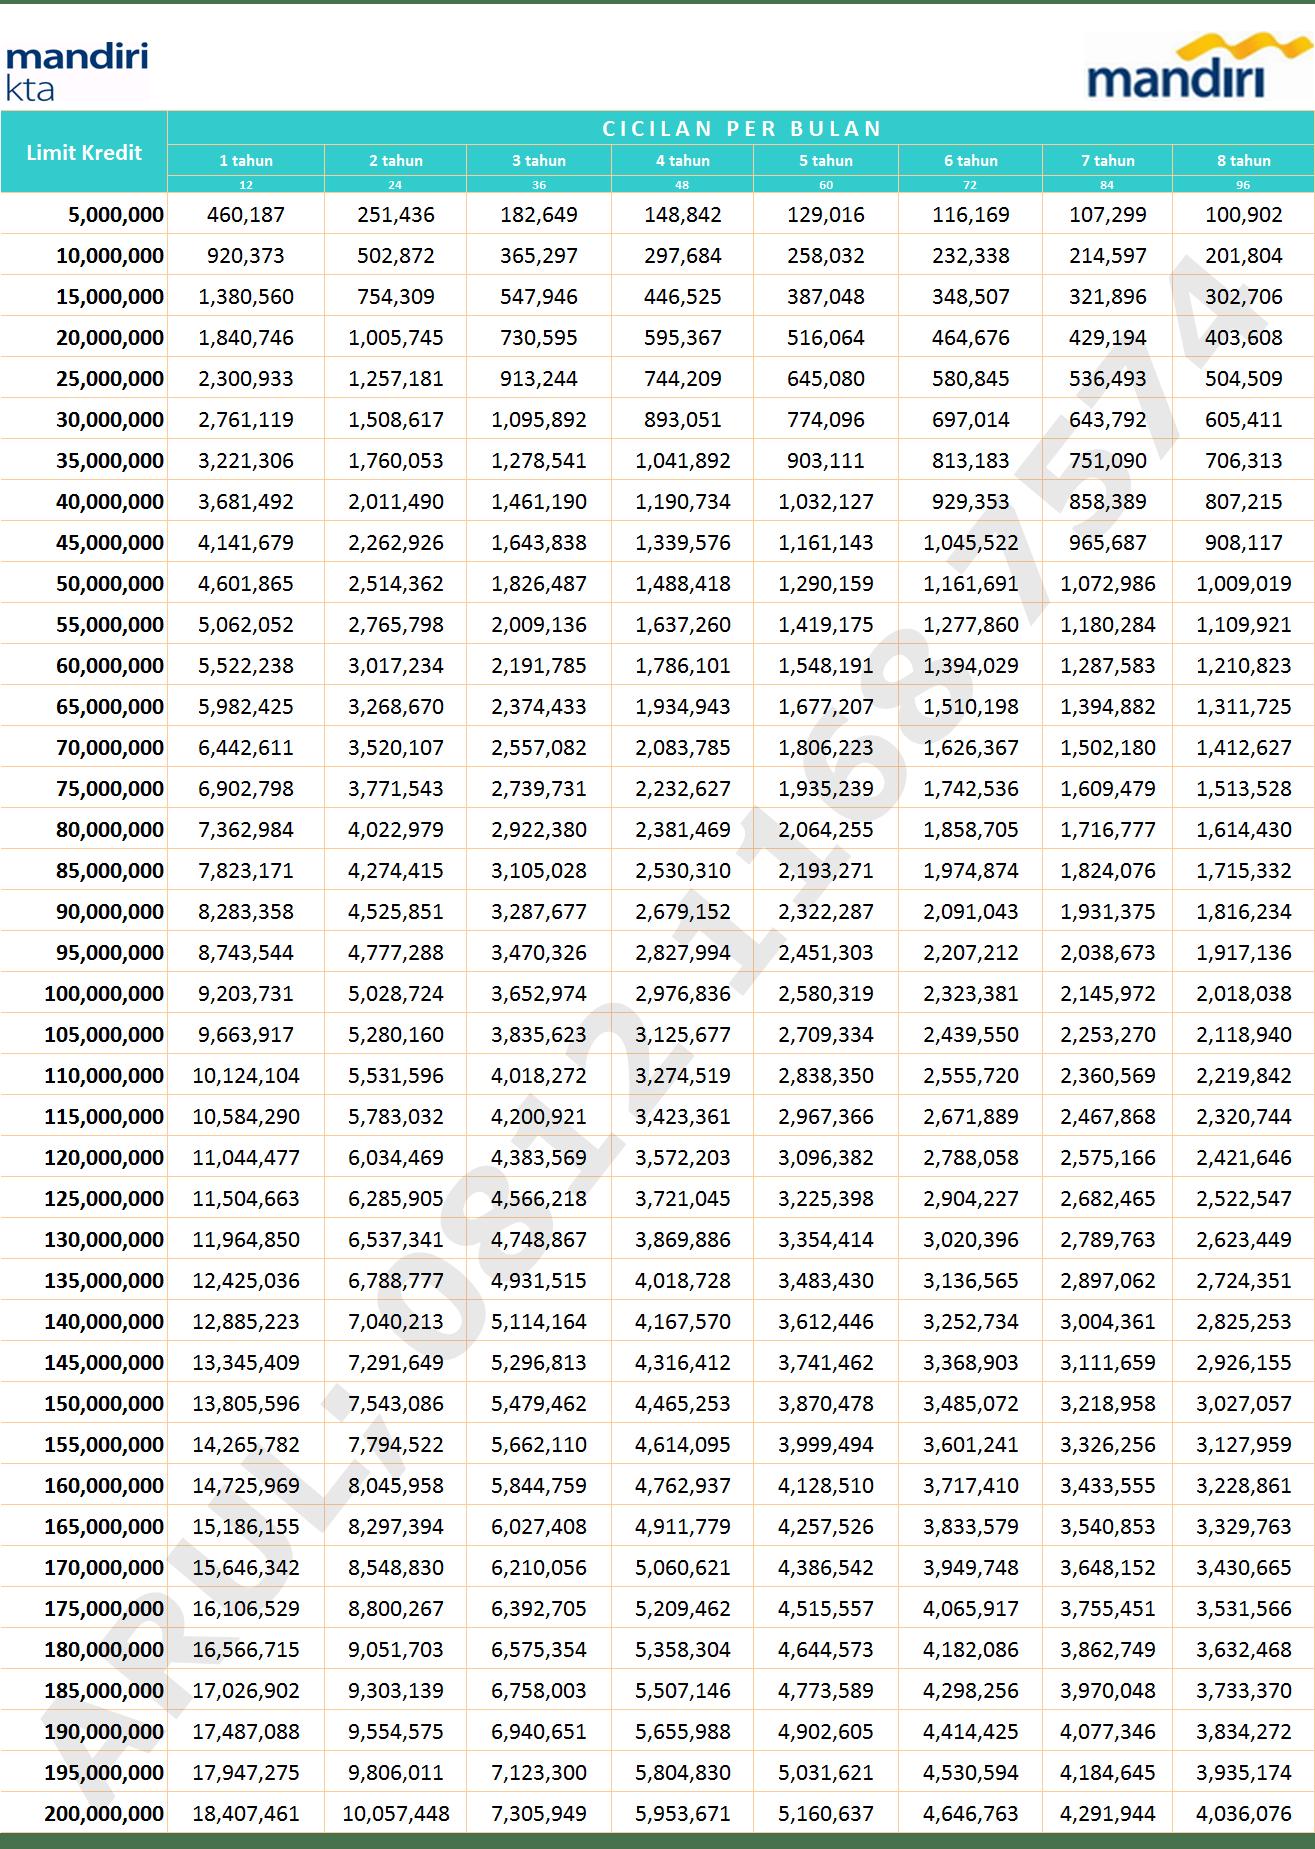 Tabel Kta Mandiri Kta Mandiri Arul 081211687574